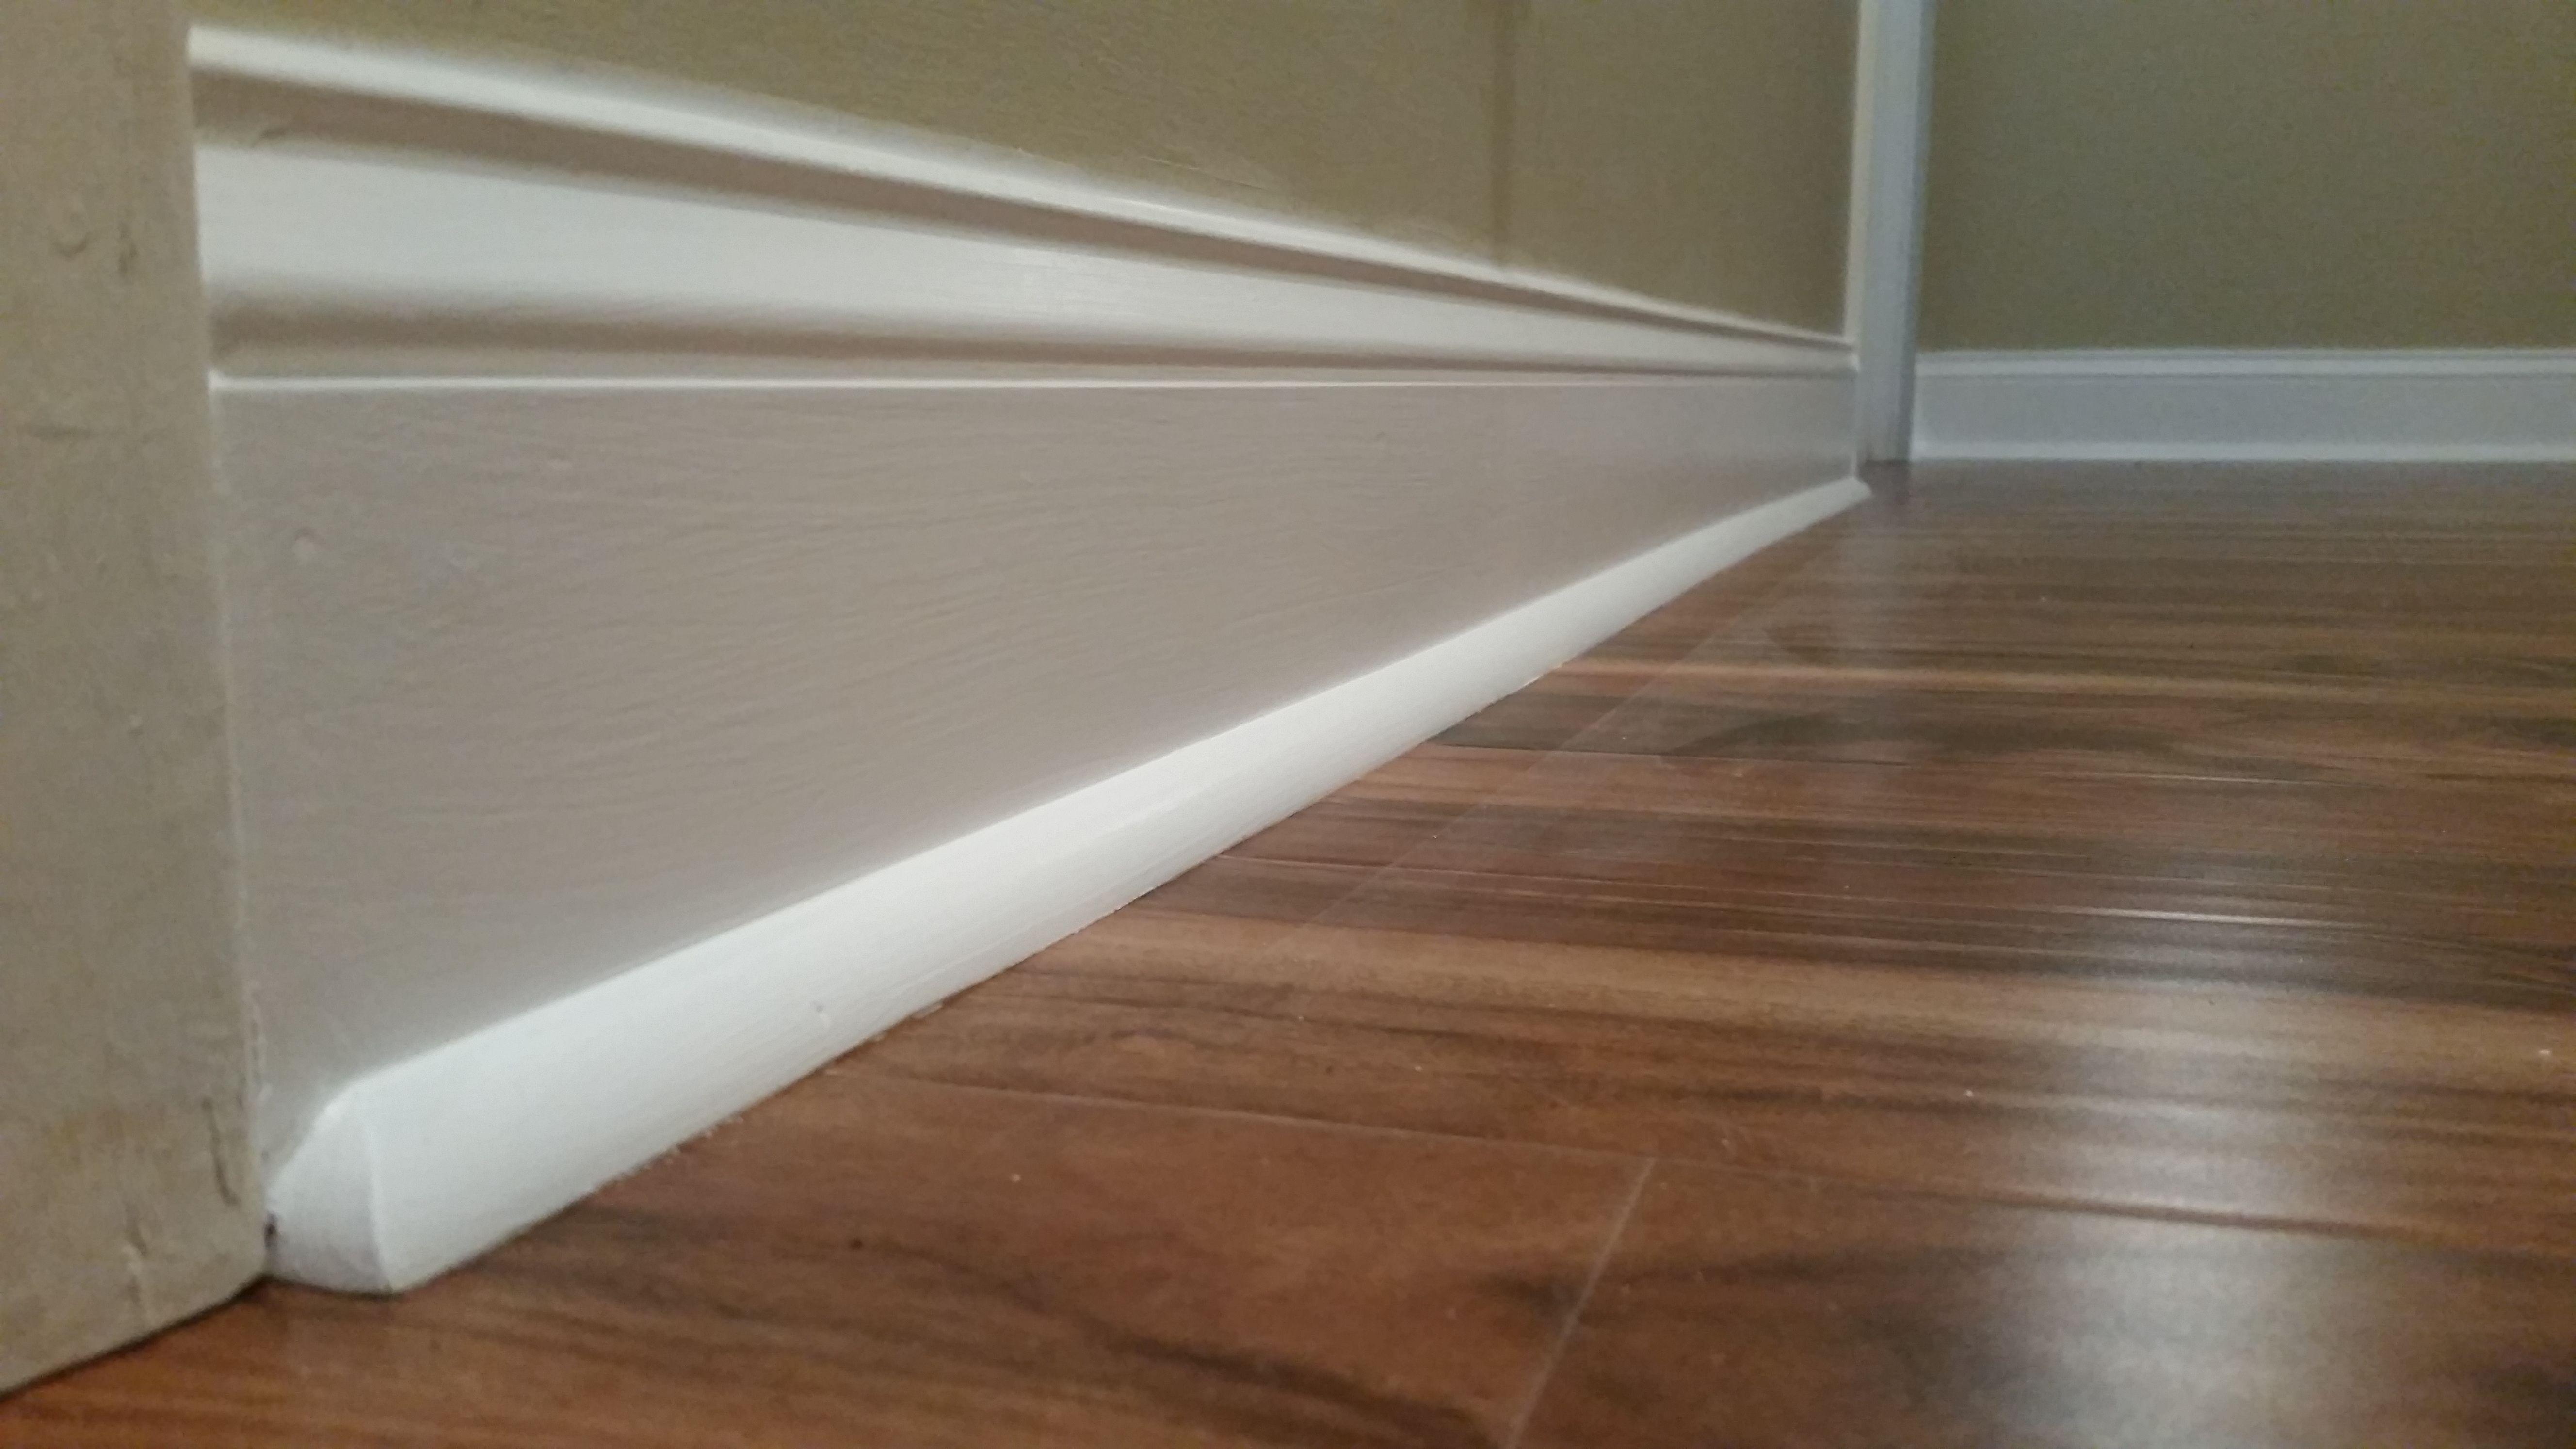 Laminate Quarter Round And Base Trim Restoration Installing Tile Floor Flooring Easy Basement Ceiling